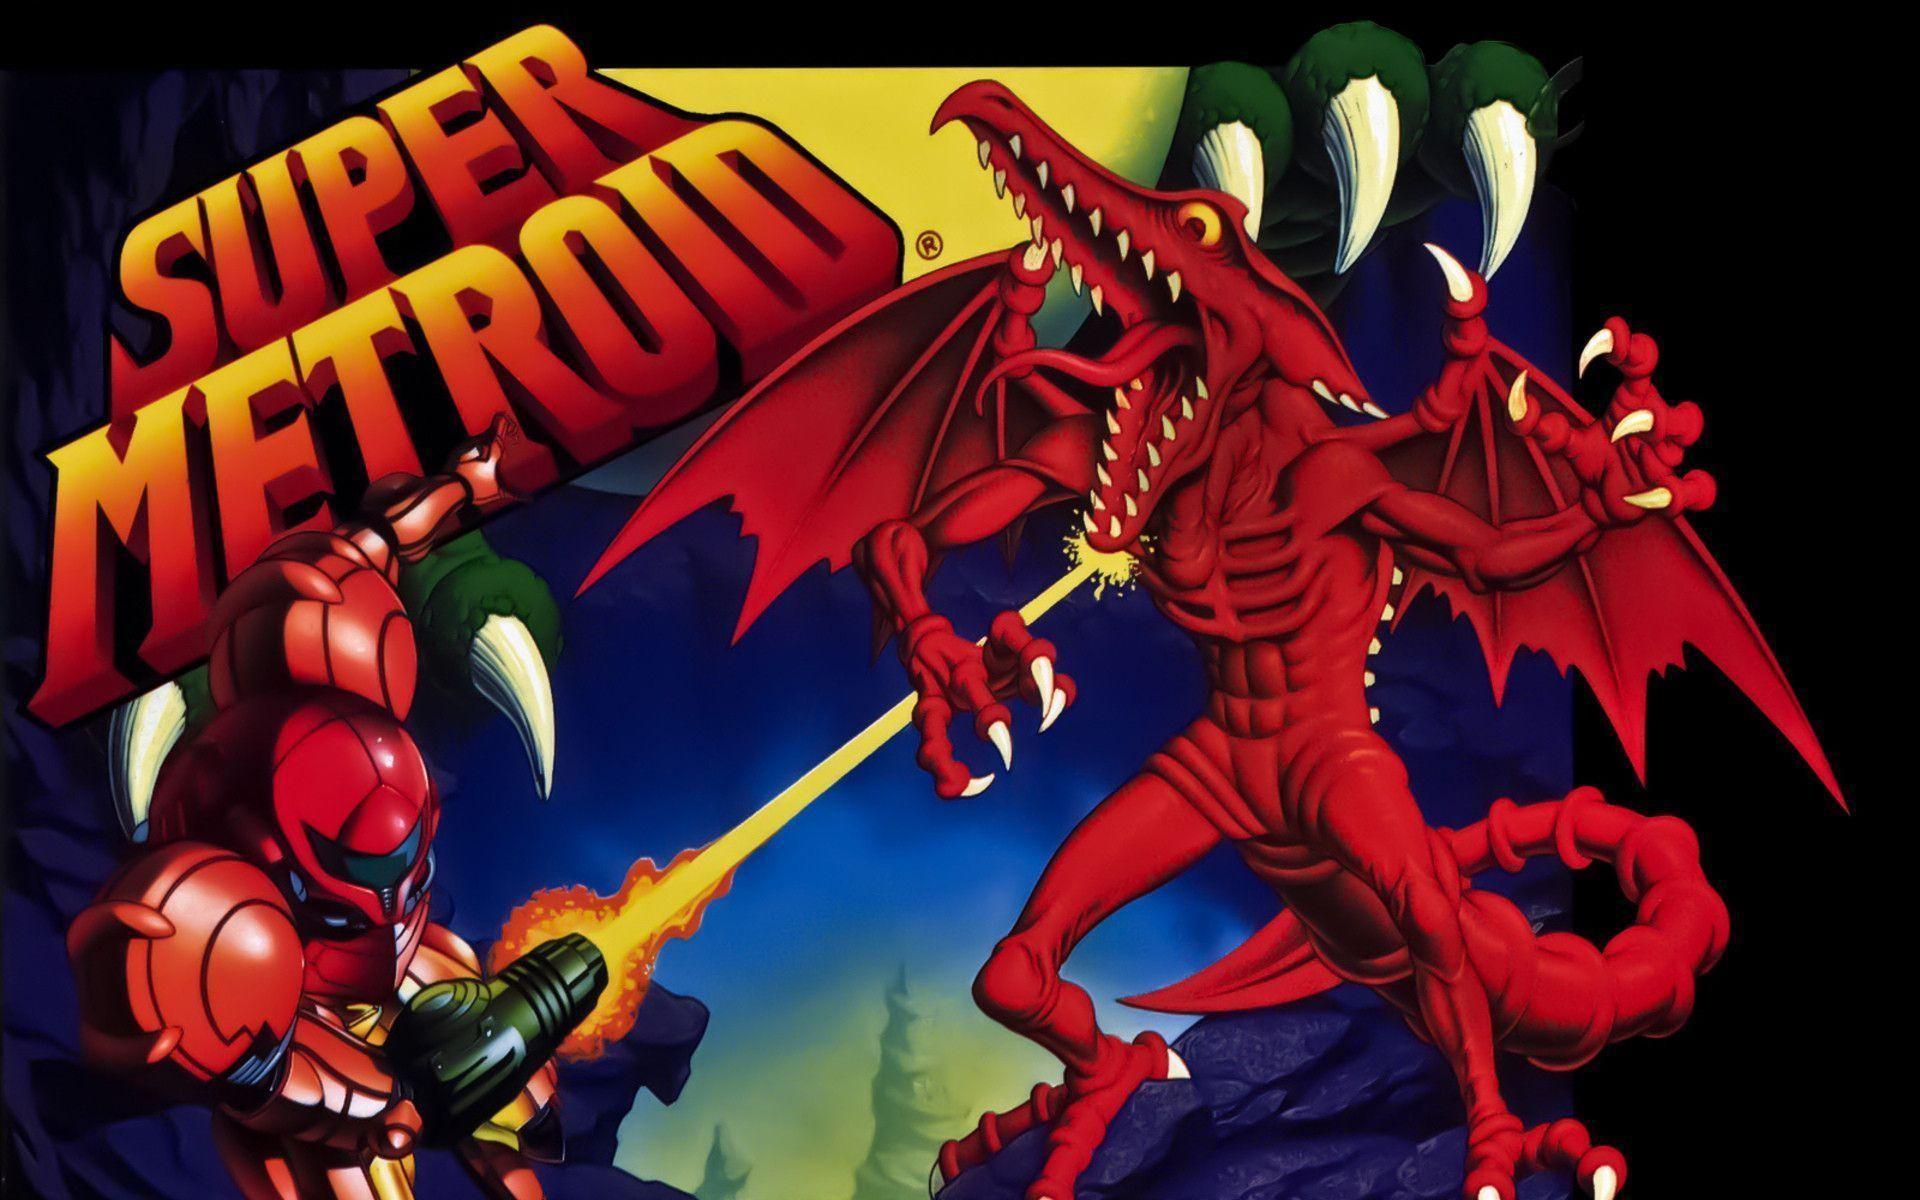 Previous Image Next Metroid Wallpaper Background